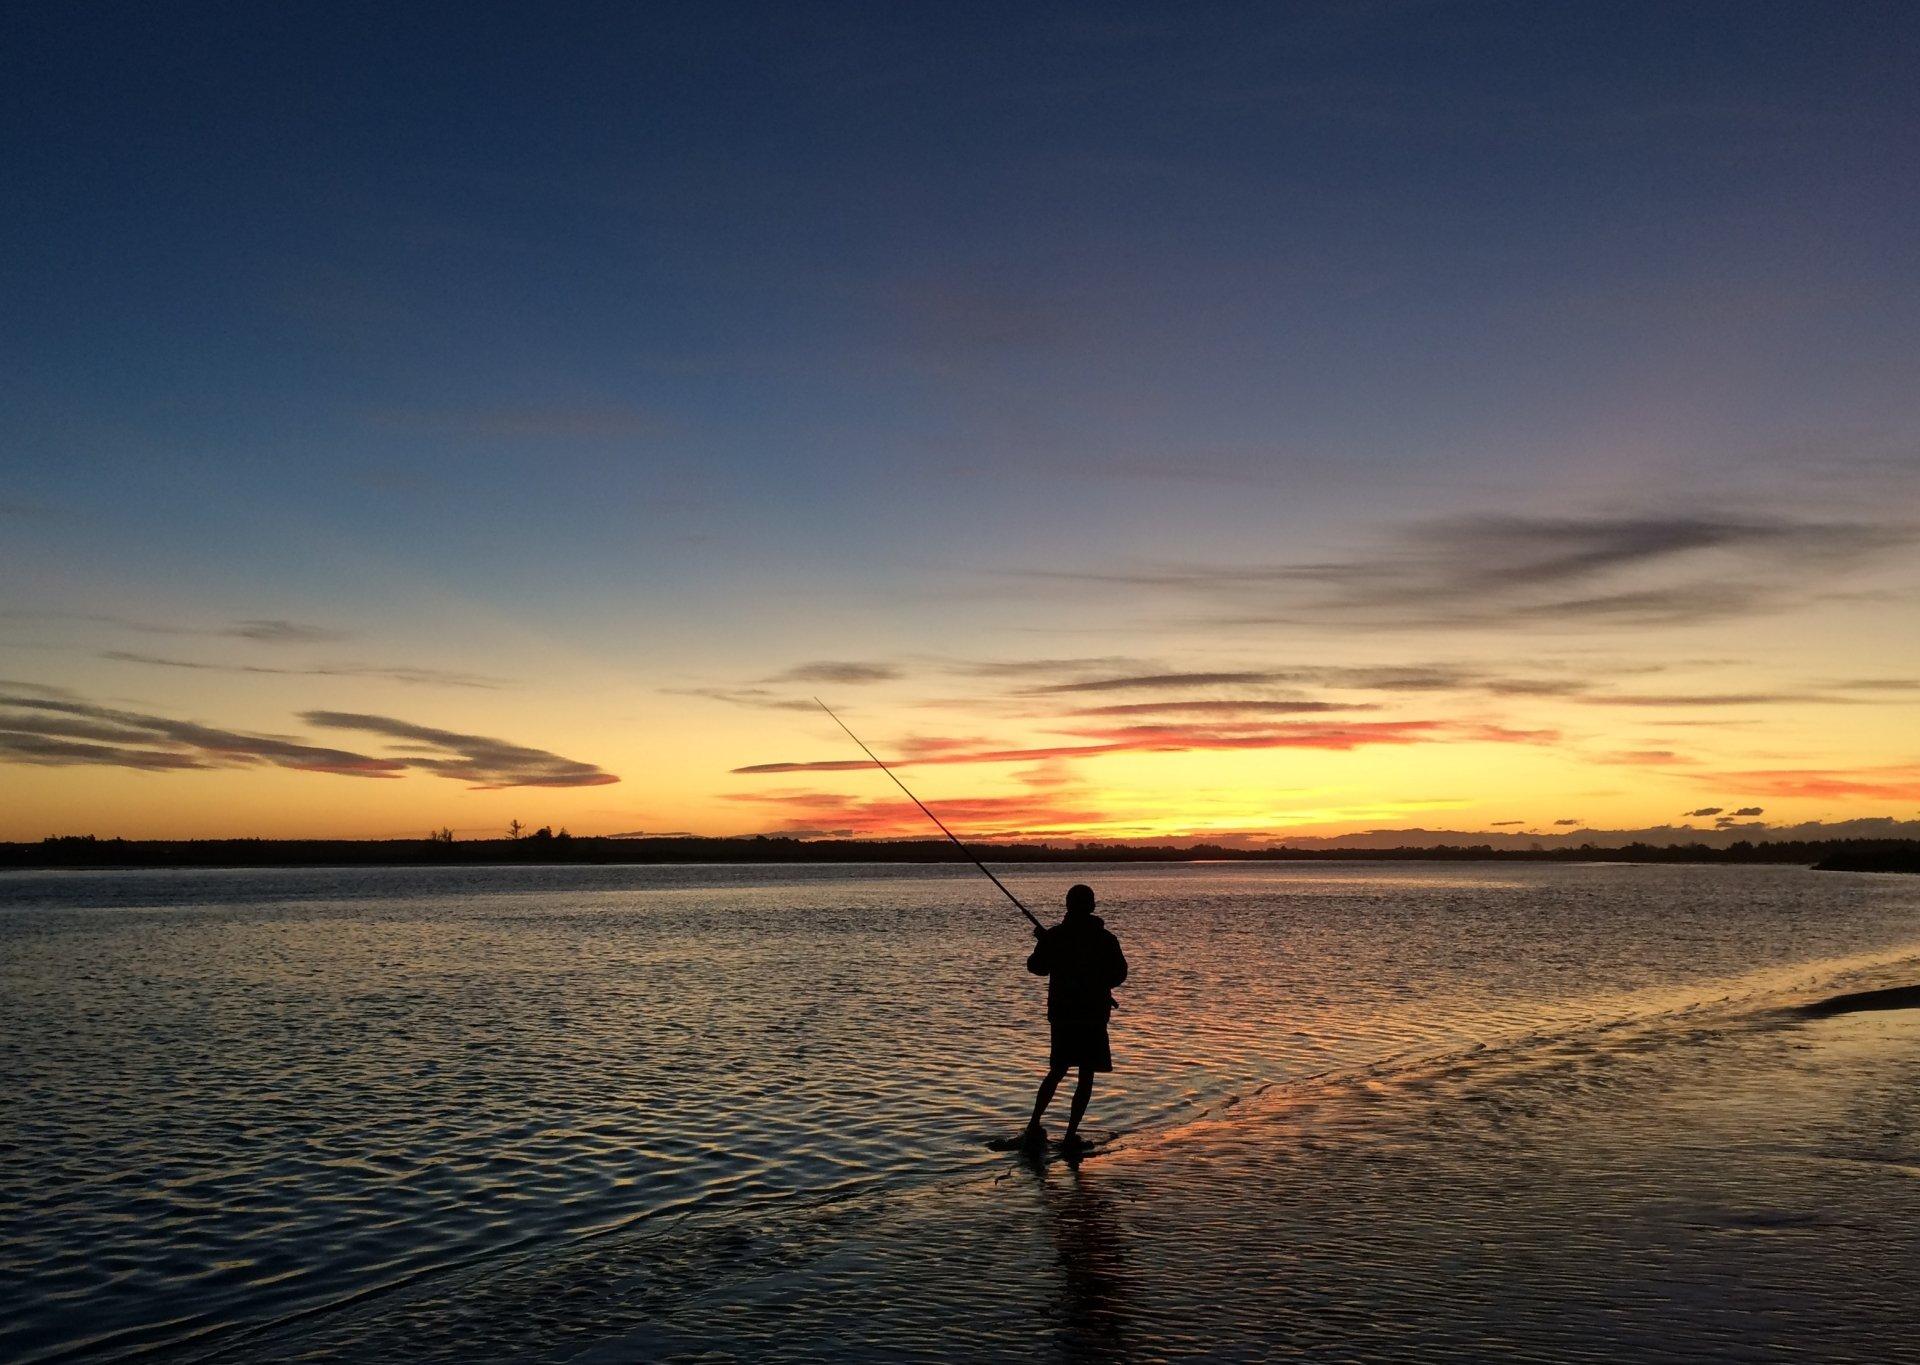 Sports - Fishing  Silhouette Sunset River Fisherman Wallpaper